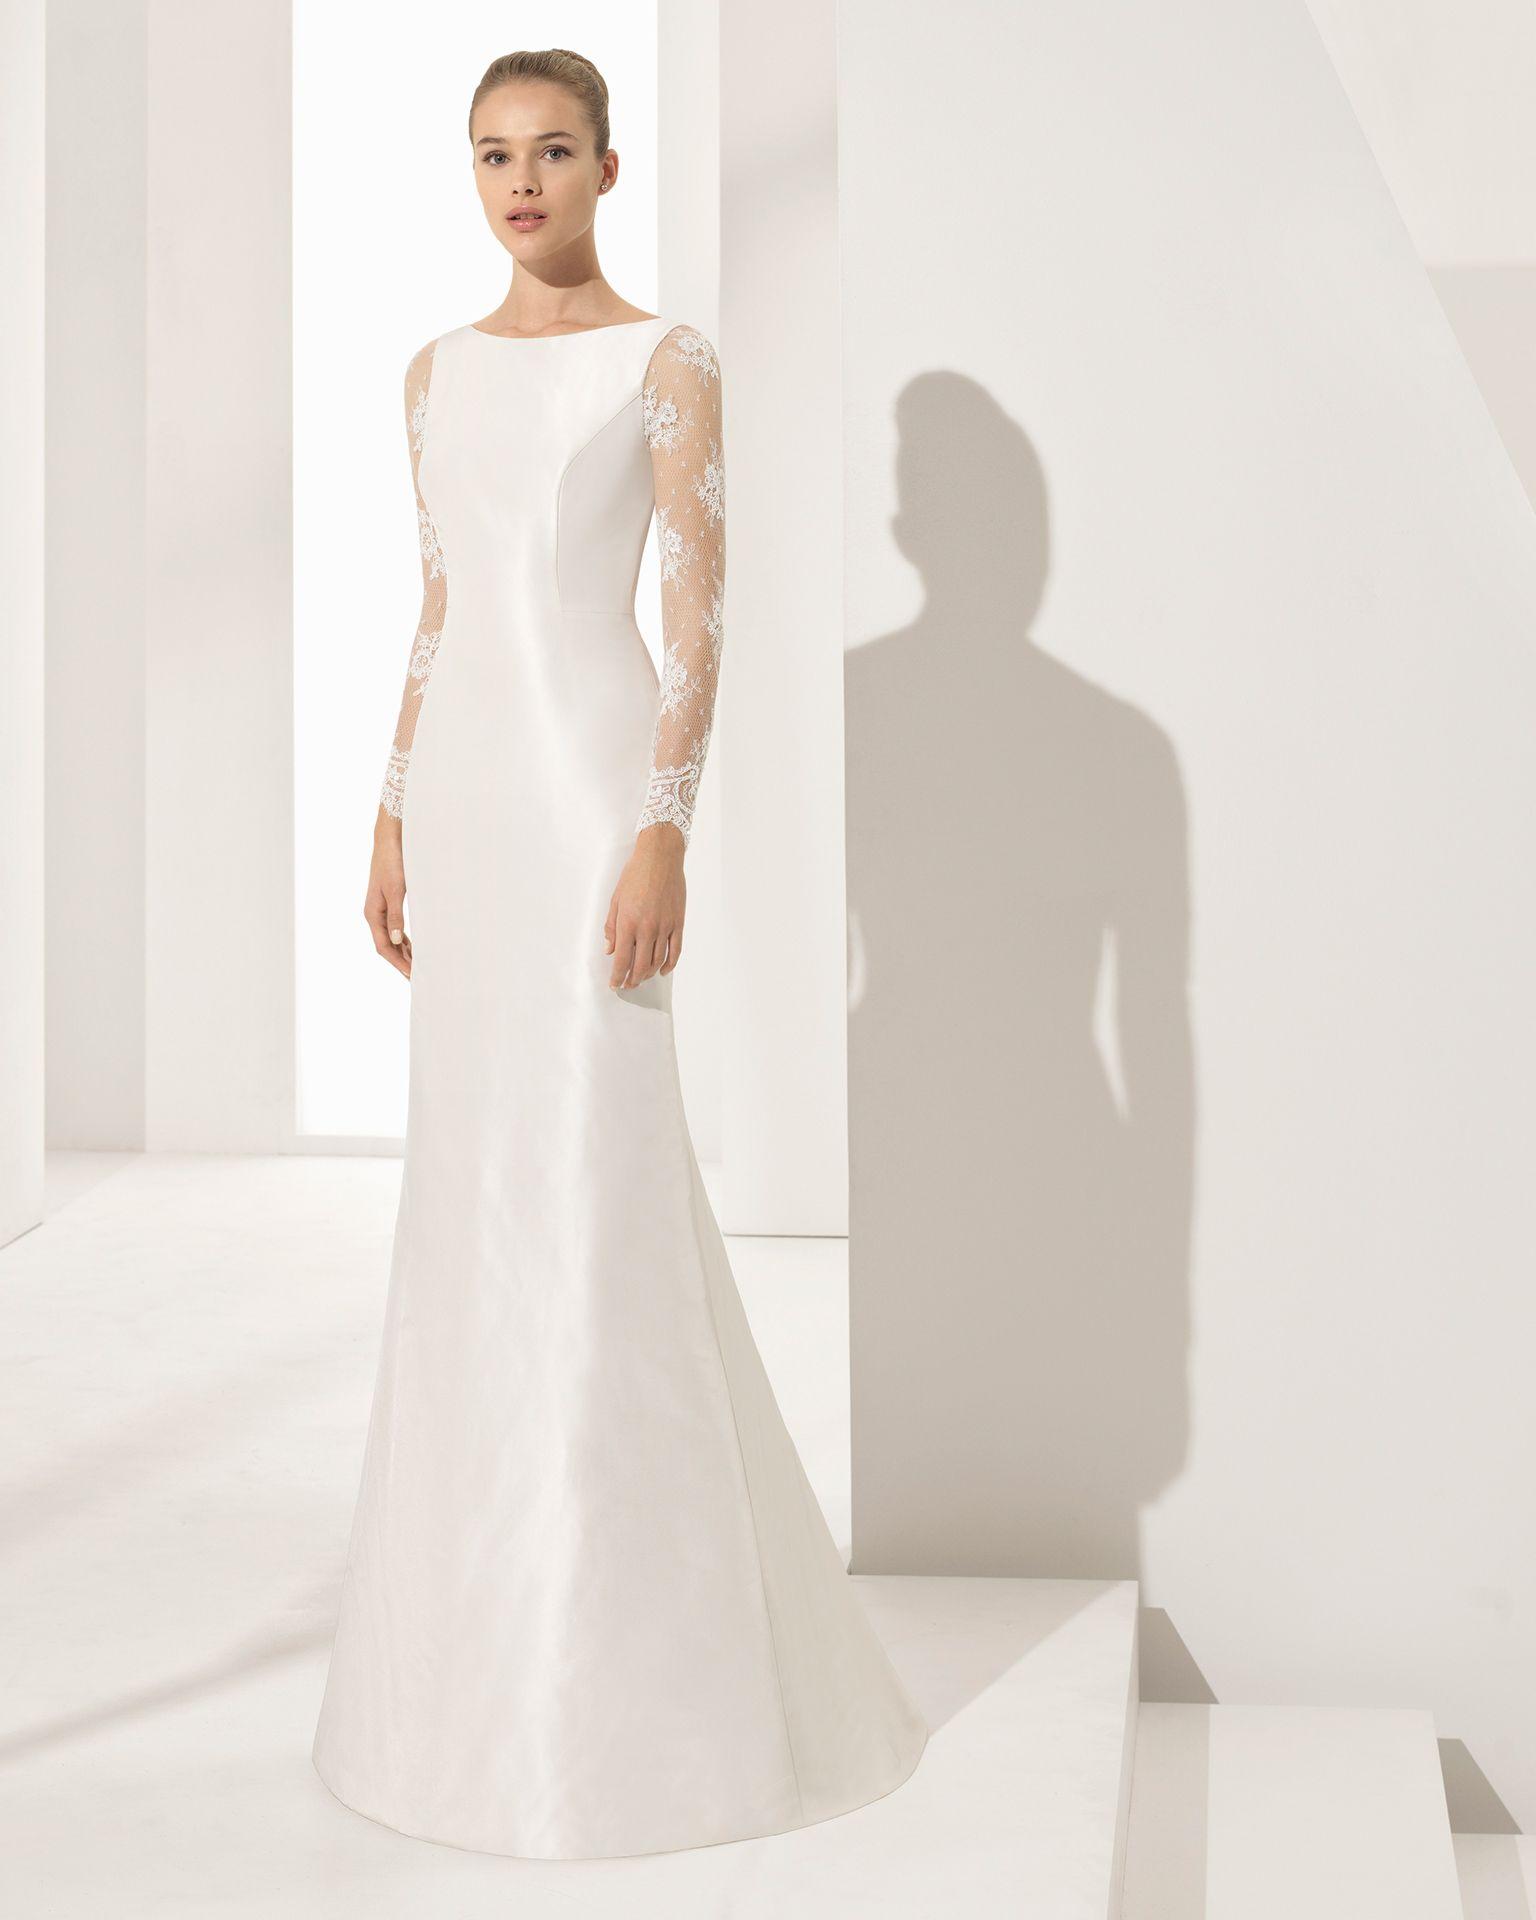 PALACIO - Hochzeit 2018. Kollektion Rosa Clará Couture | Pinterest ...